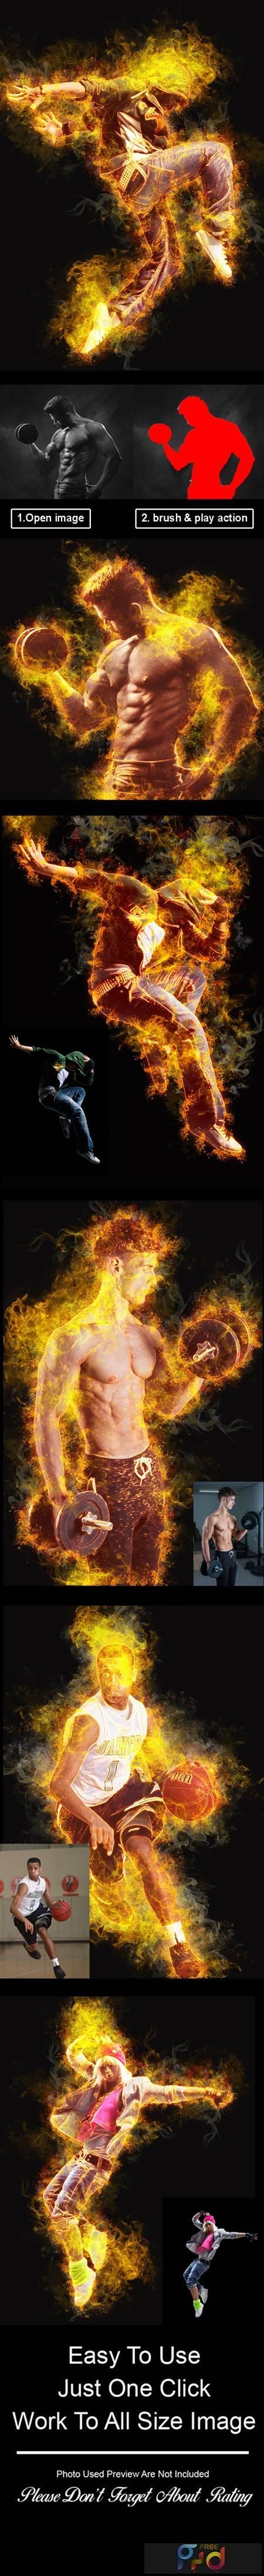 Amazing Flame Photoshop Action Vol 2 28223950 1